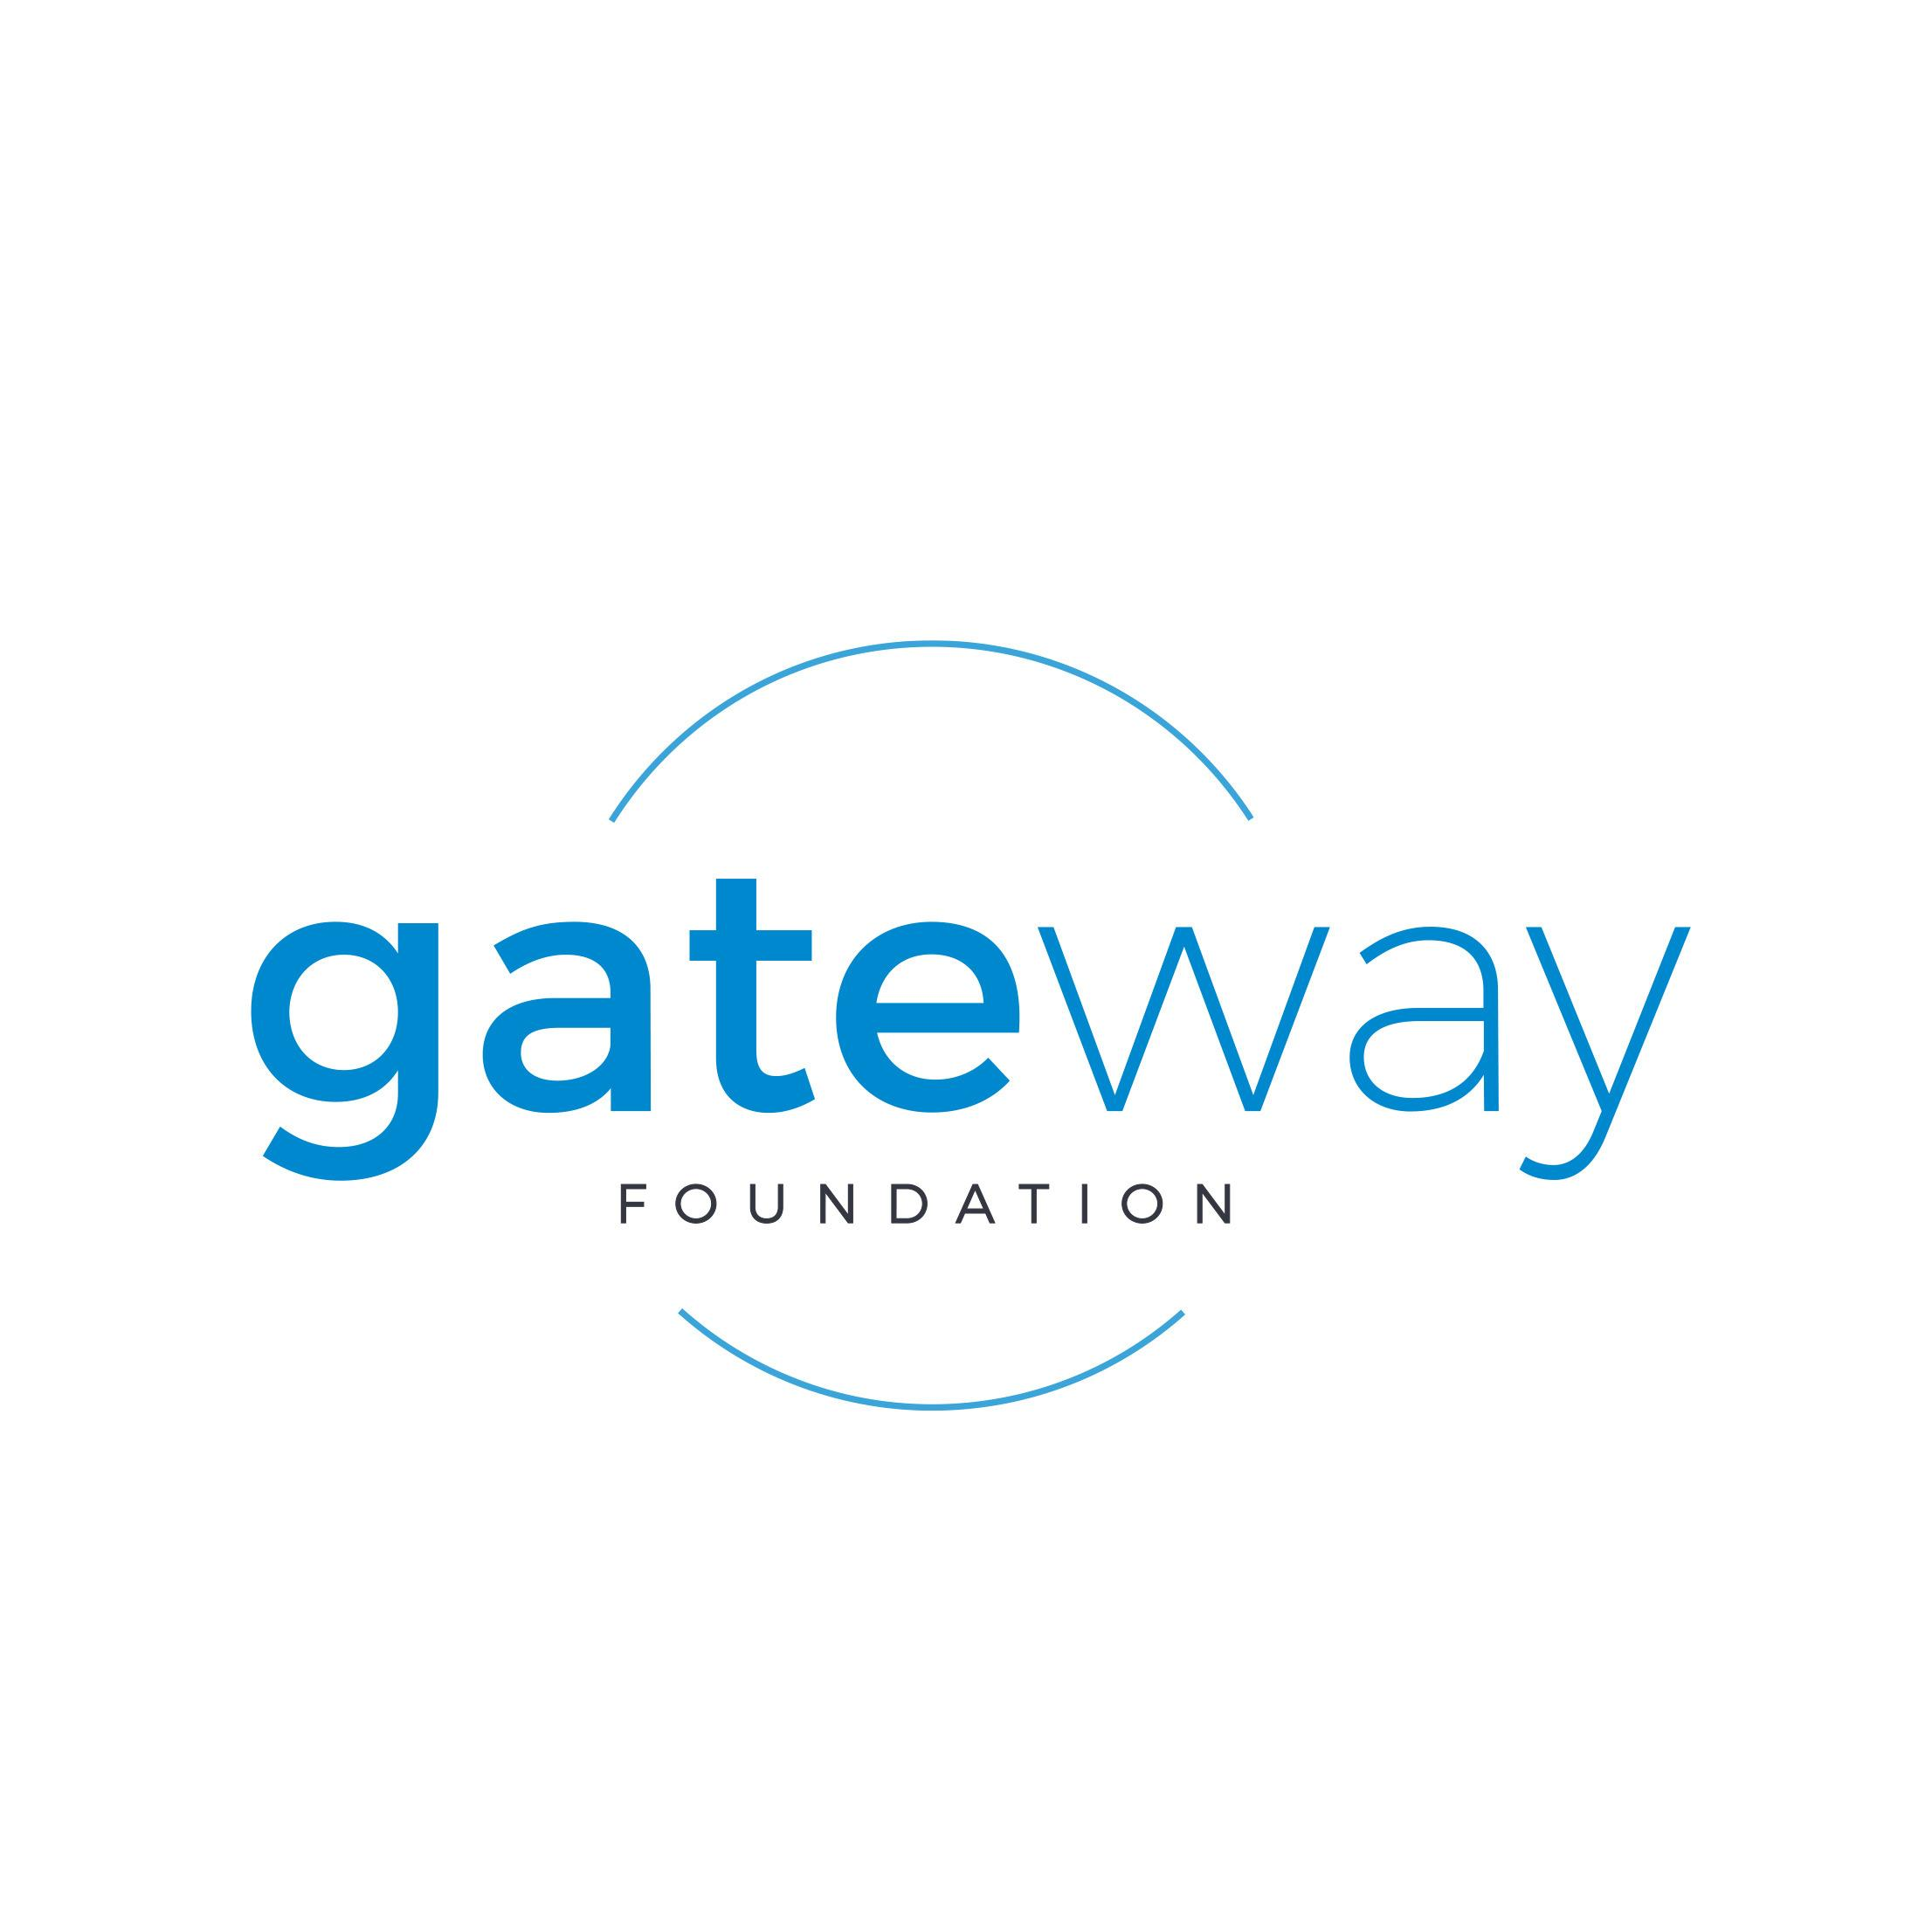 Gateway Foundation Alcohol & Drug Treatment Centers - Jacksonville